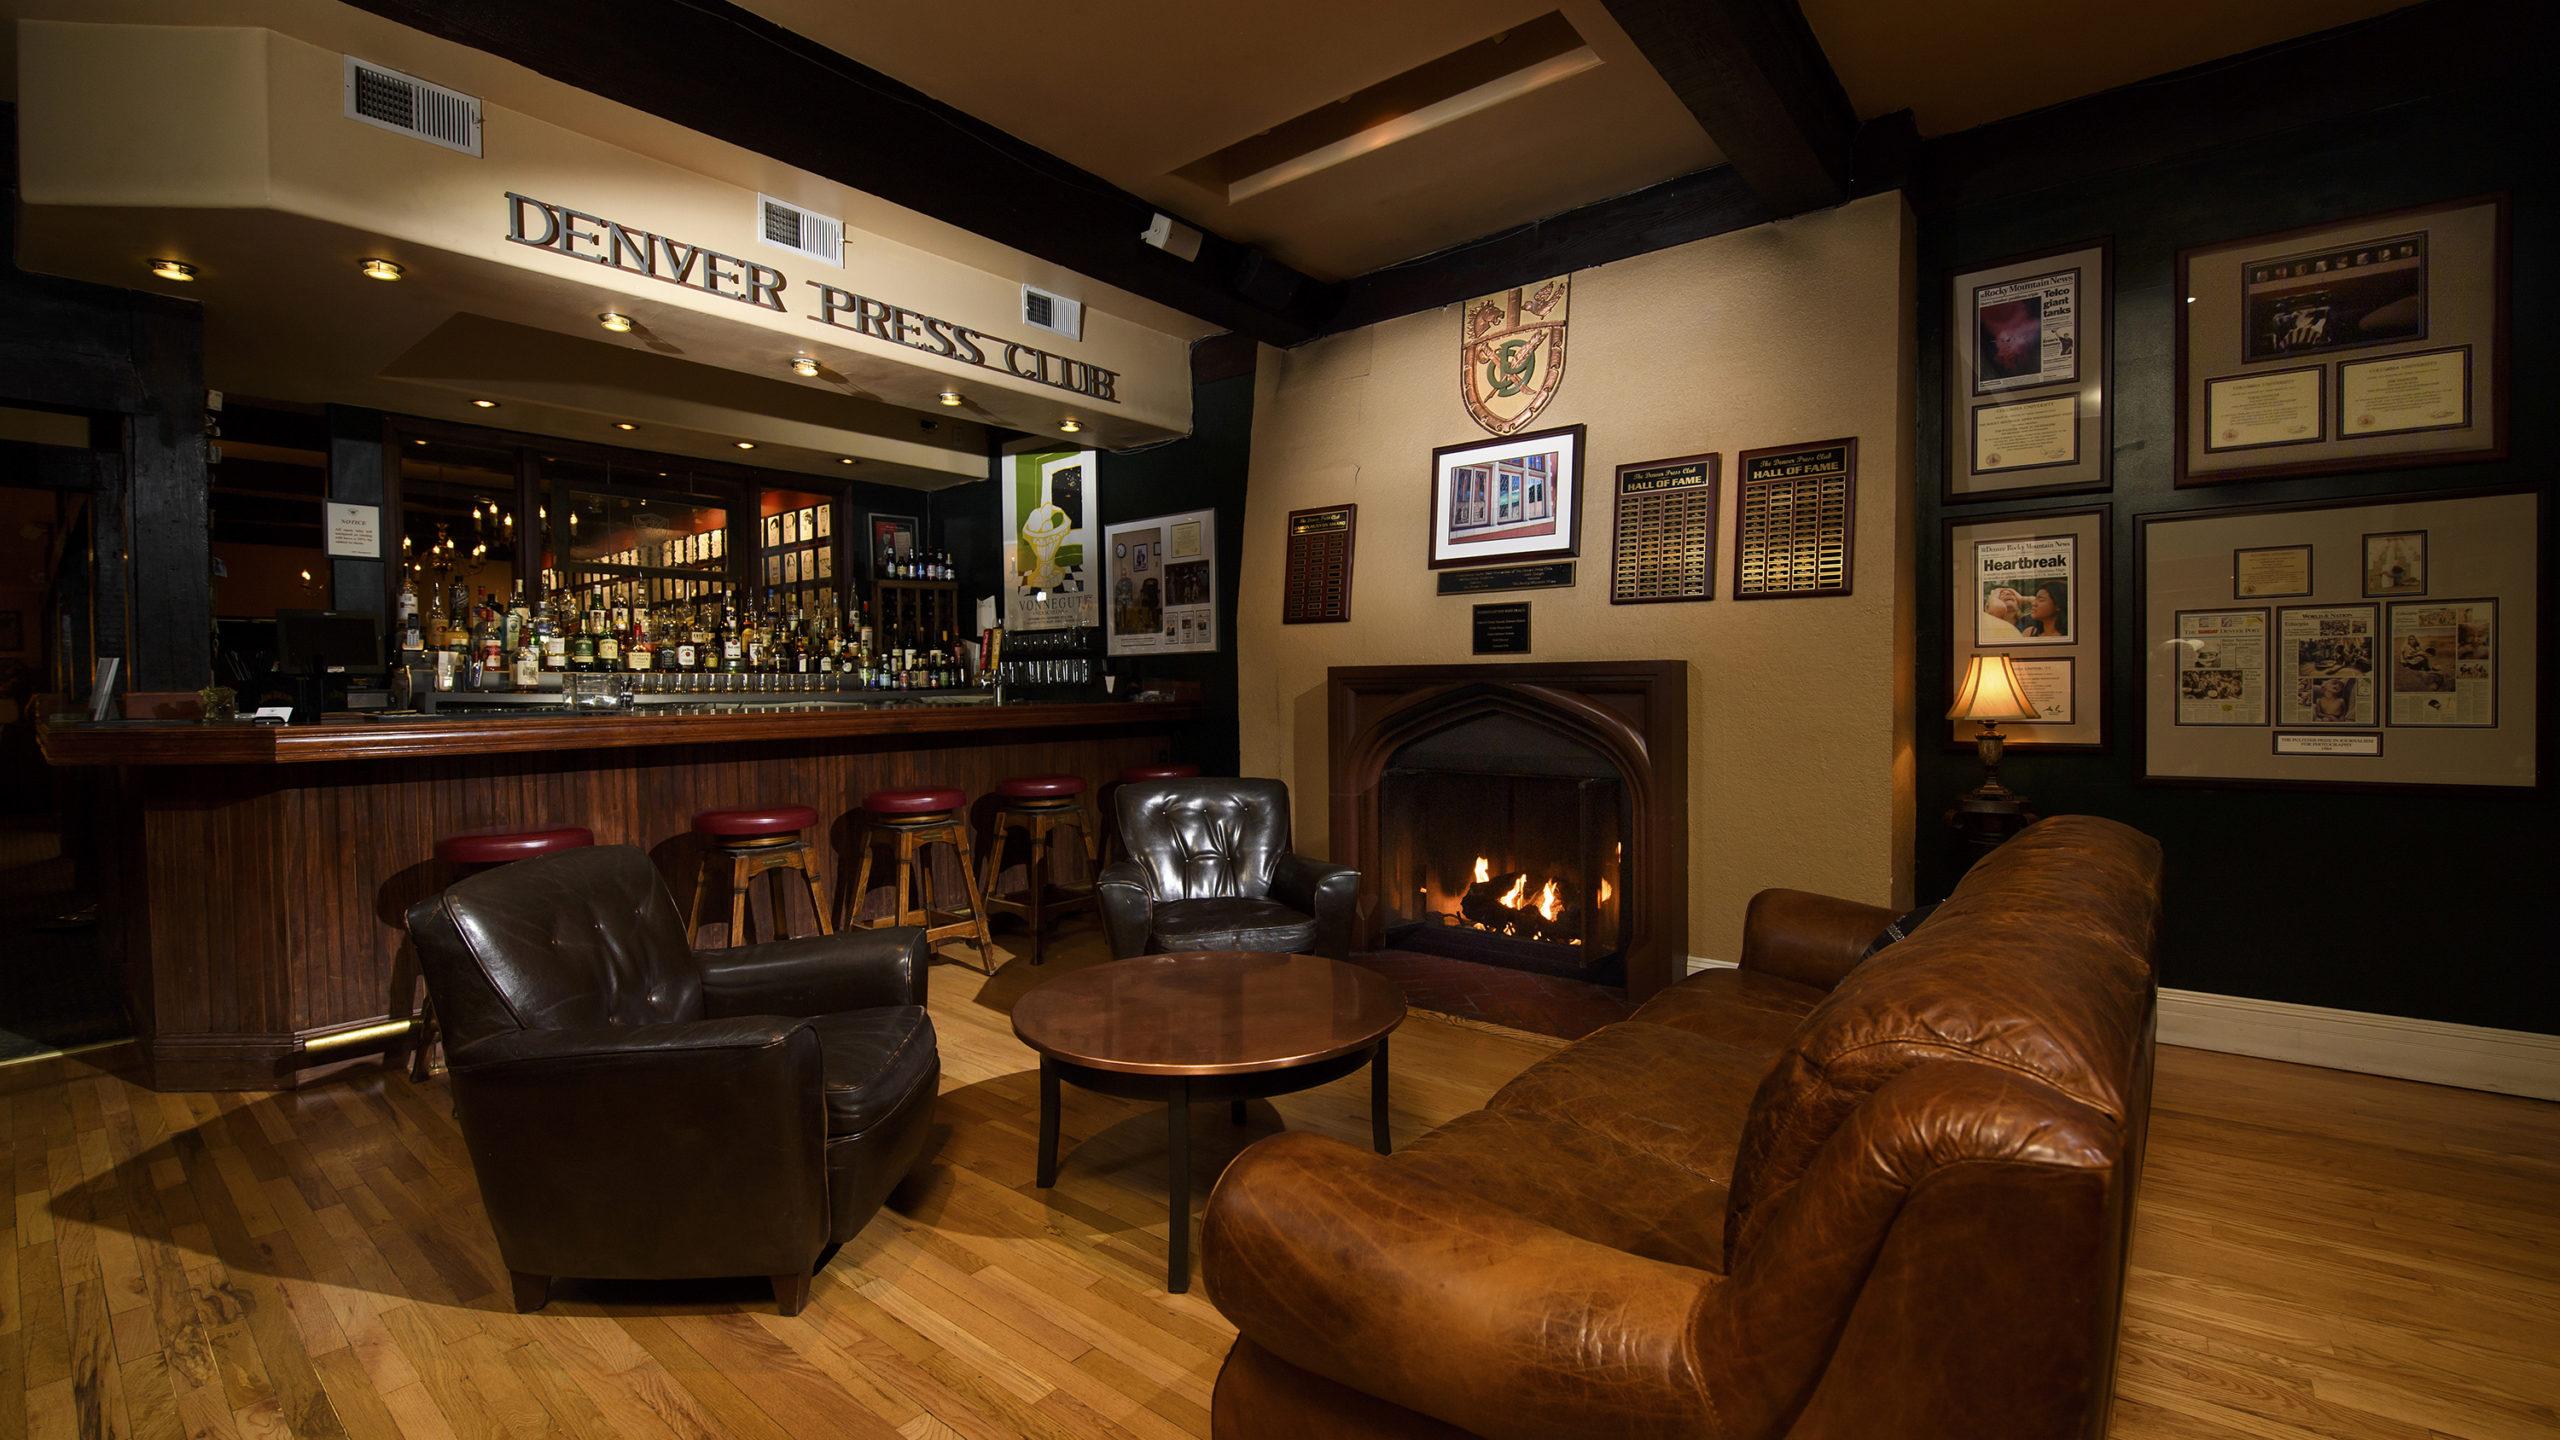 Inside the Denver Press Club lounge